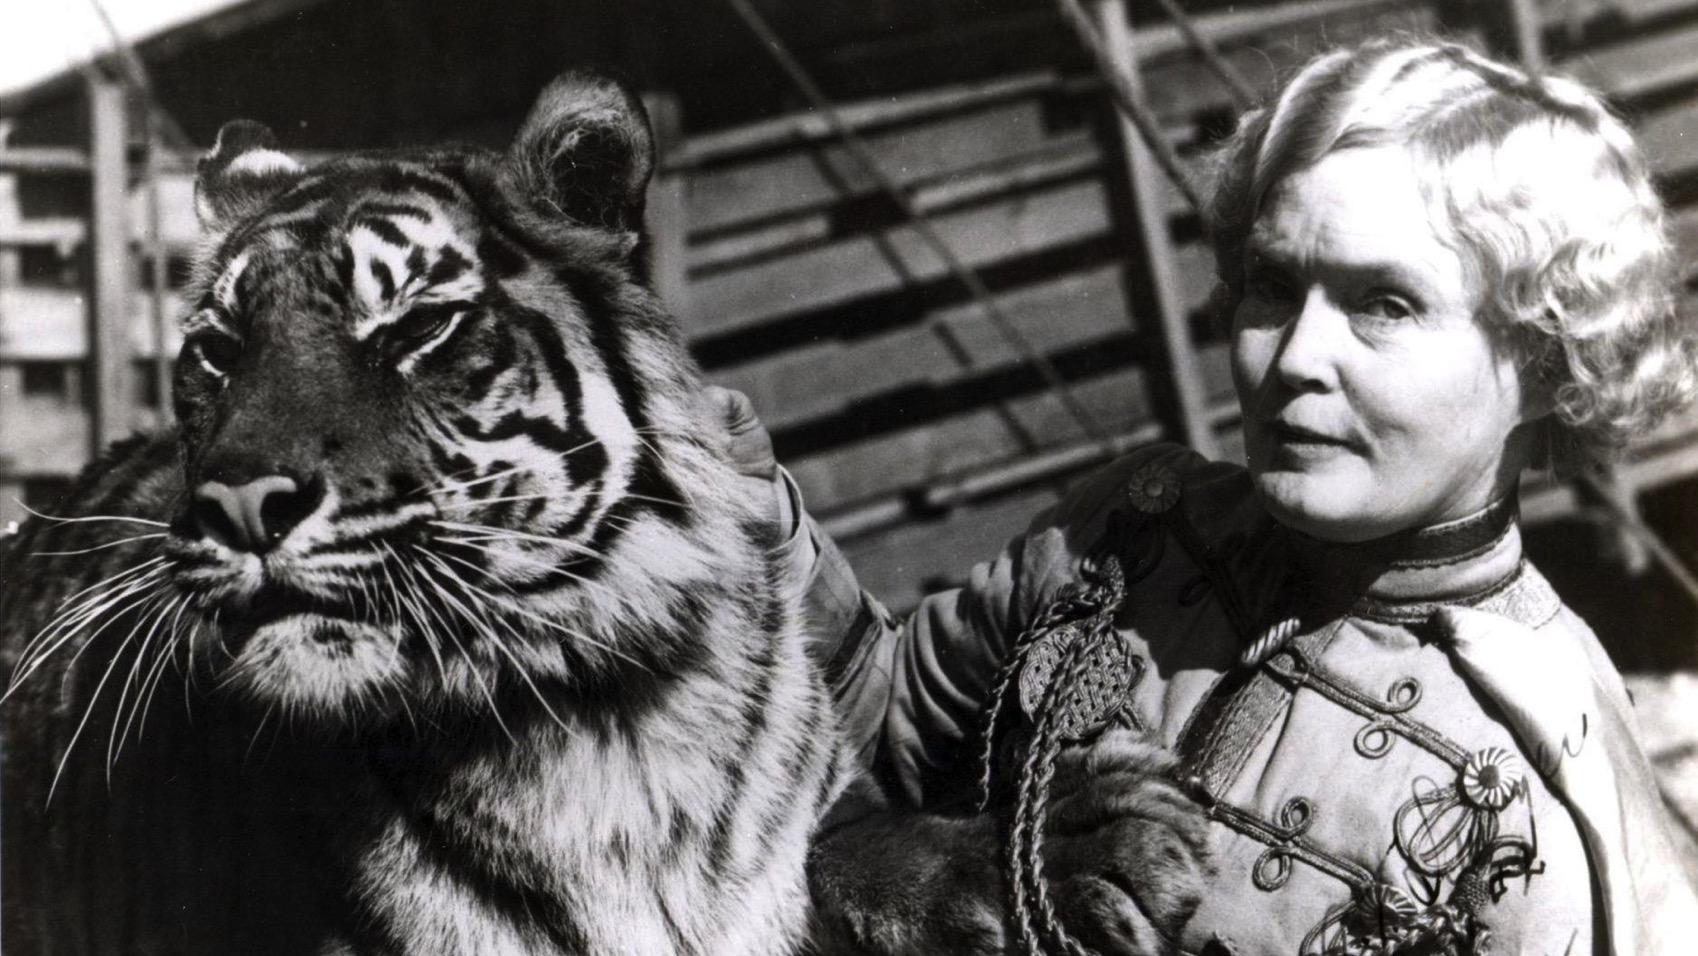 Ct ae mabel stark tiger tamer kogan sidewalks 0318